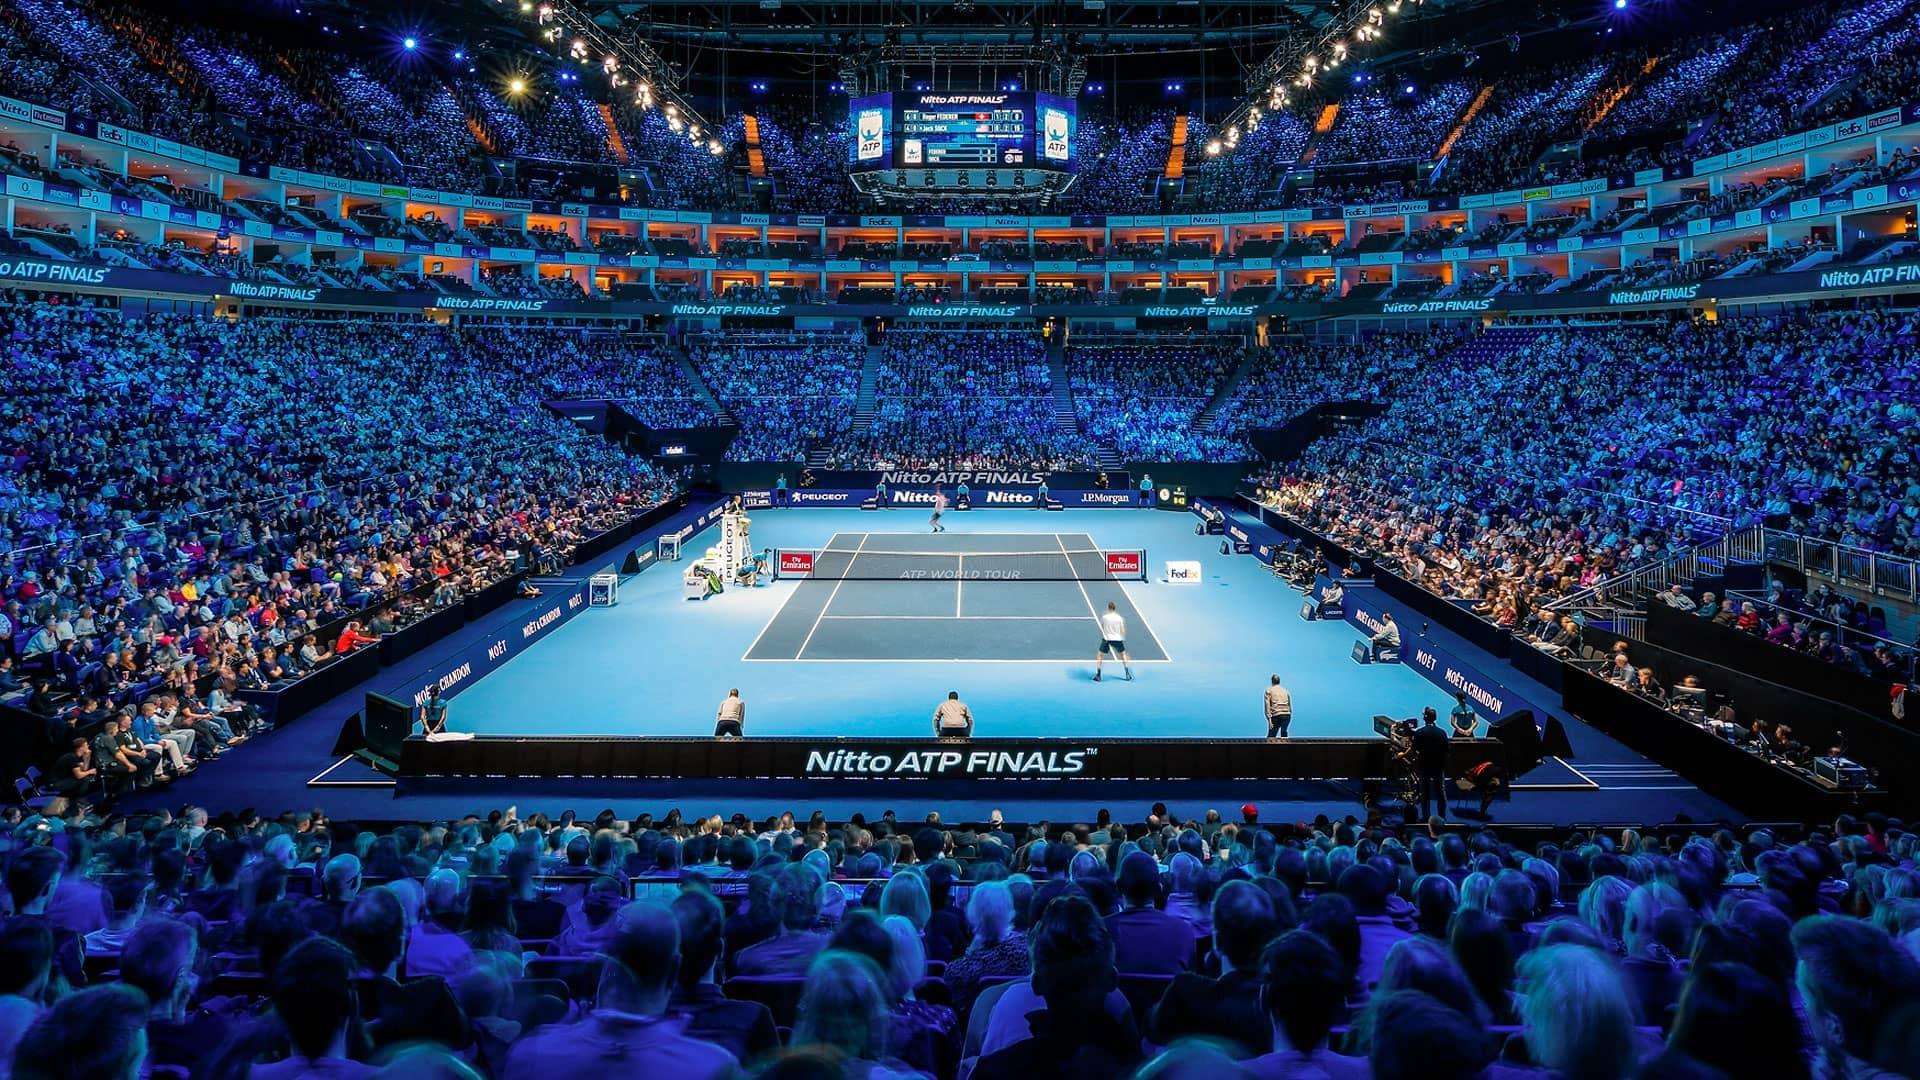 Nitto Atp Finals Complete Record Breaking Attendance Across 2017 Atp World Tour Season Atp Tour Tennis